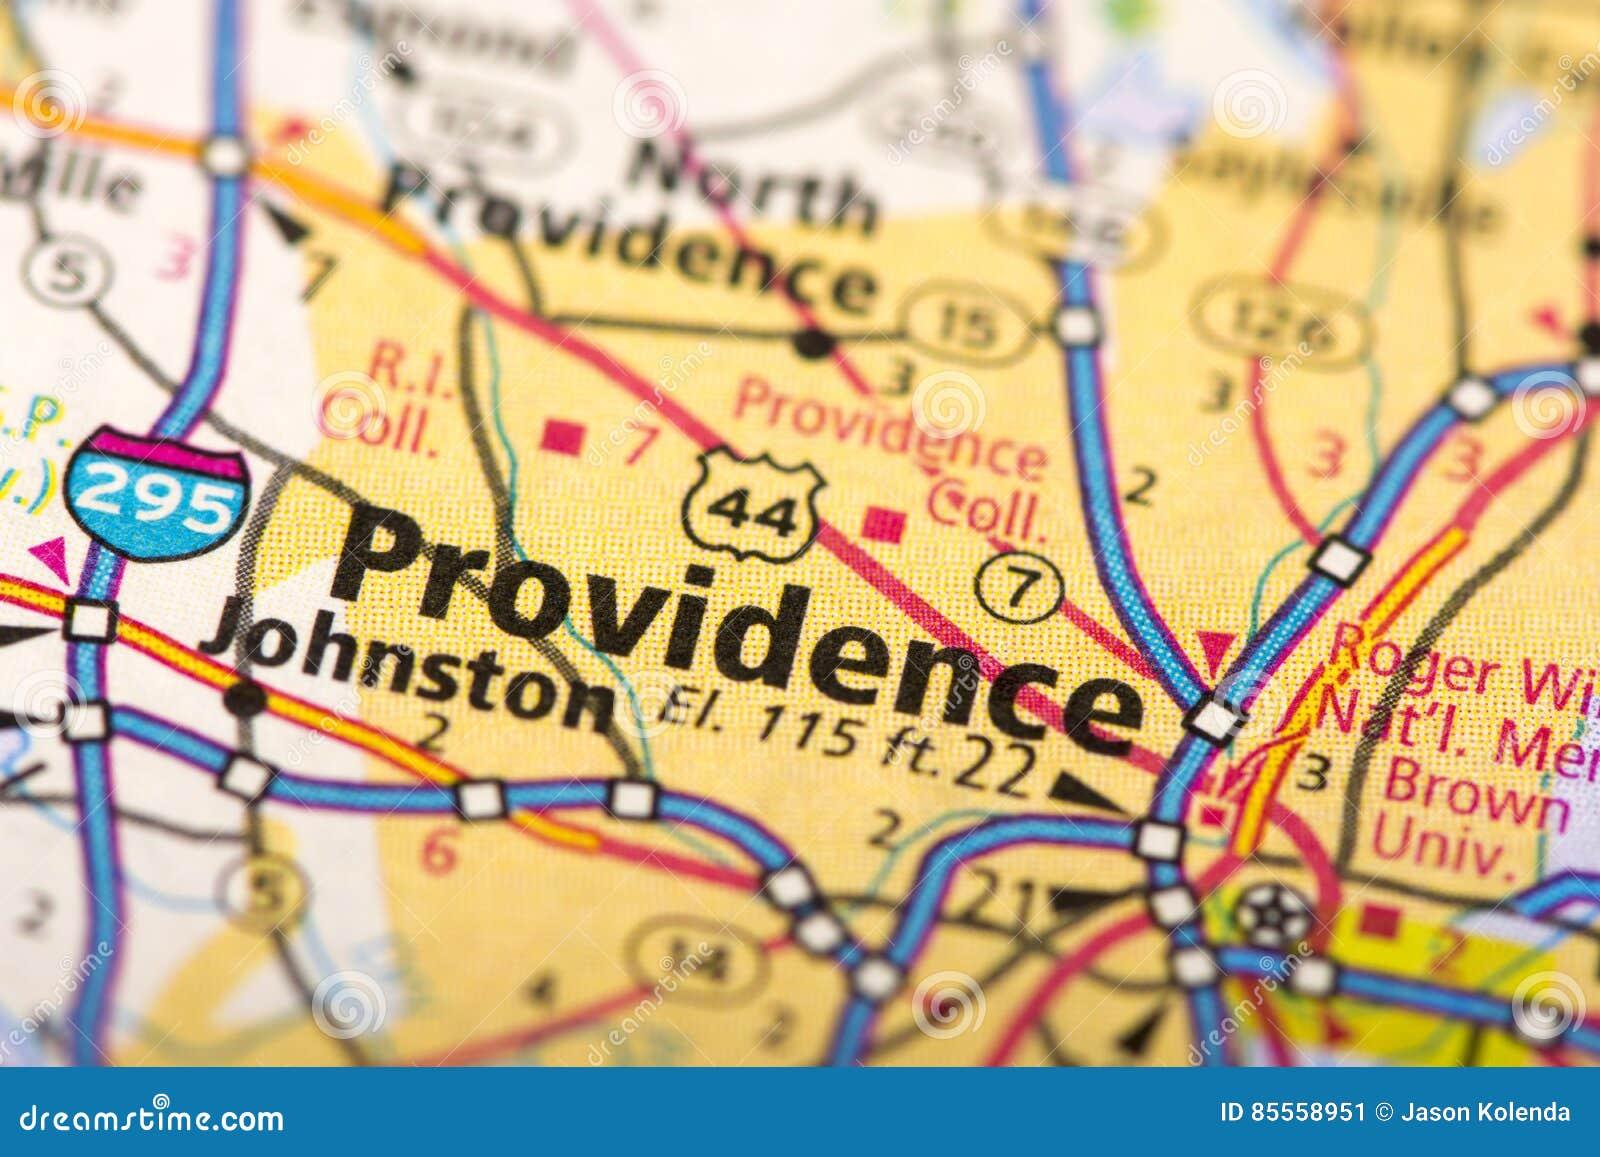 Providence, Rhode Island on map